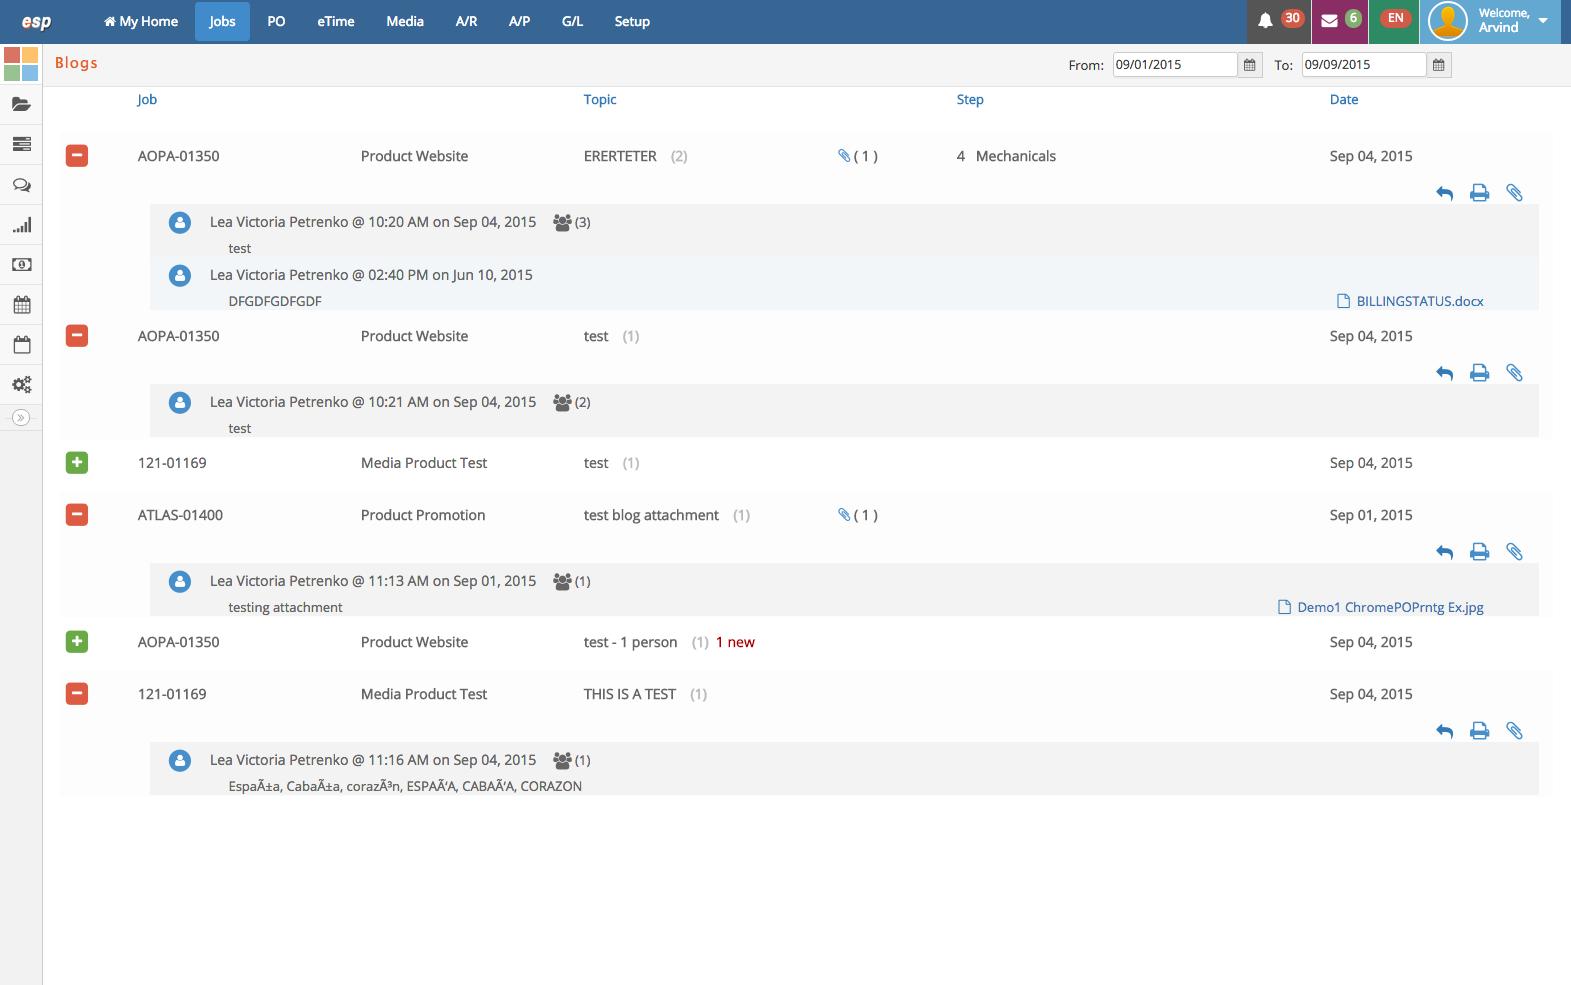 eSilentPARTNER Software - Job Blogs